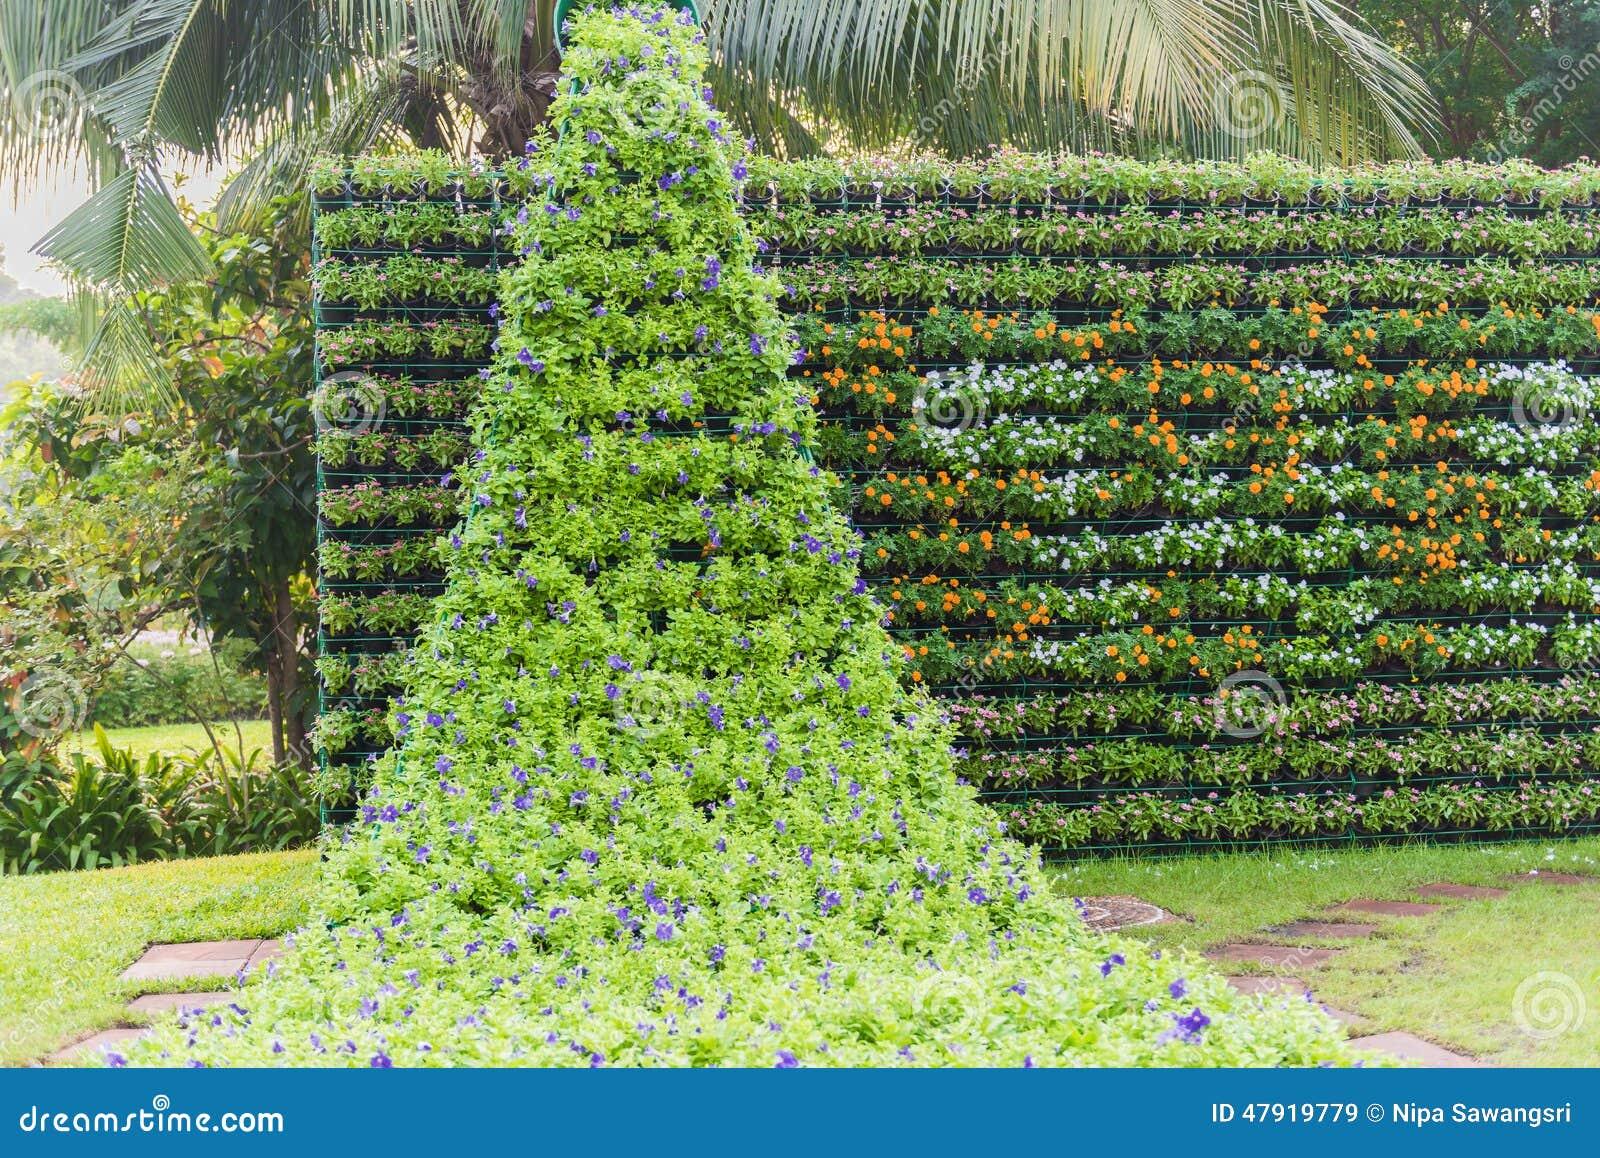 Flower wall vertical garden stock image image of for Flower wall garden